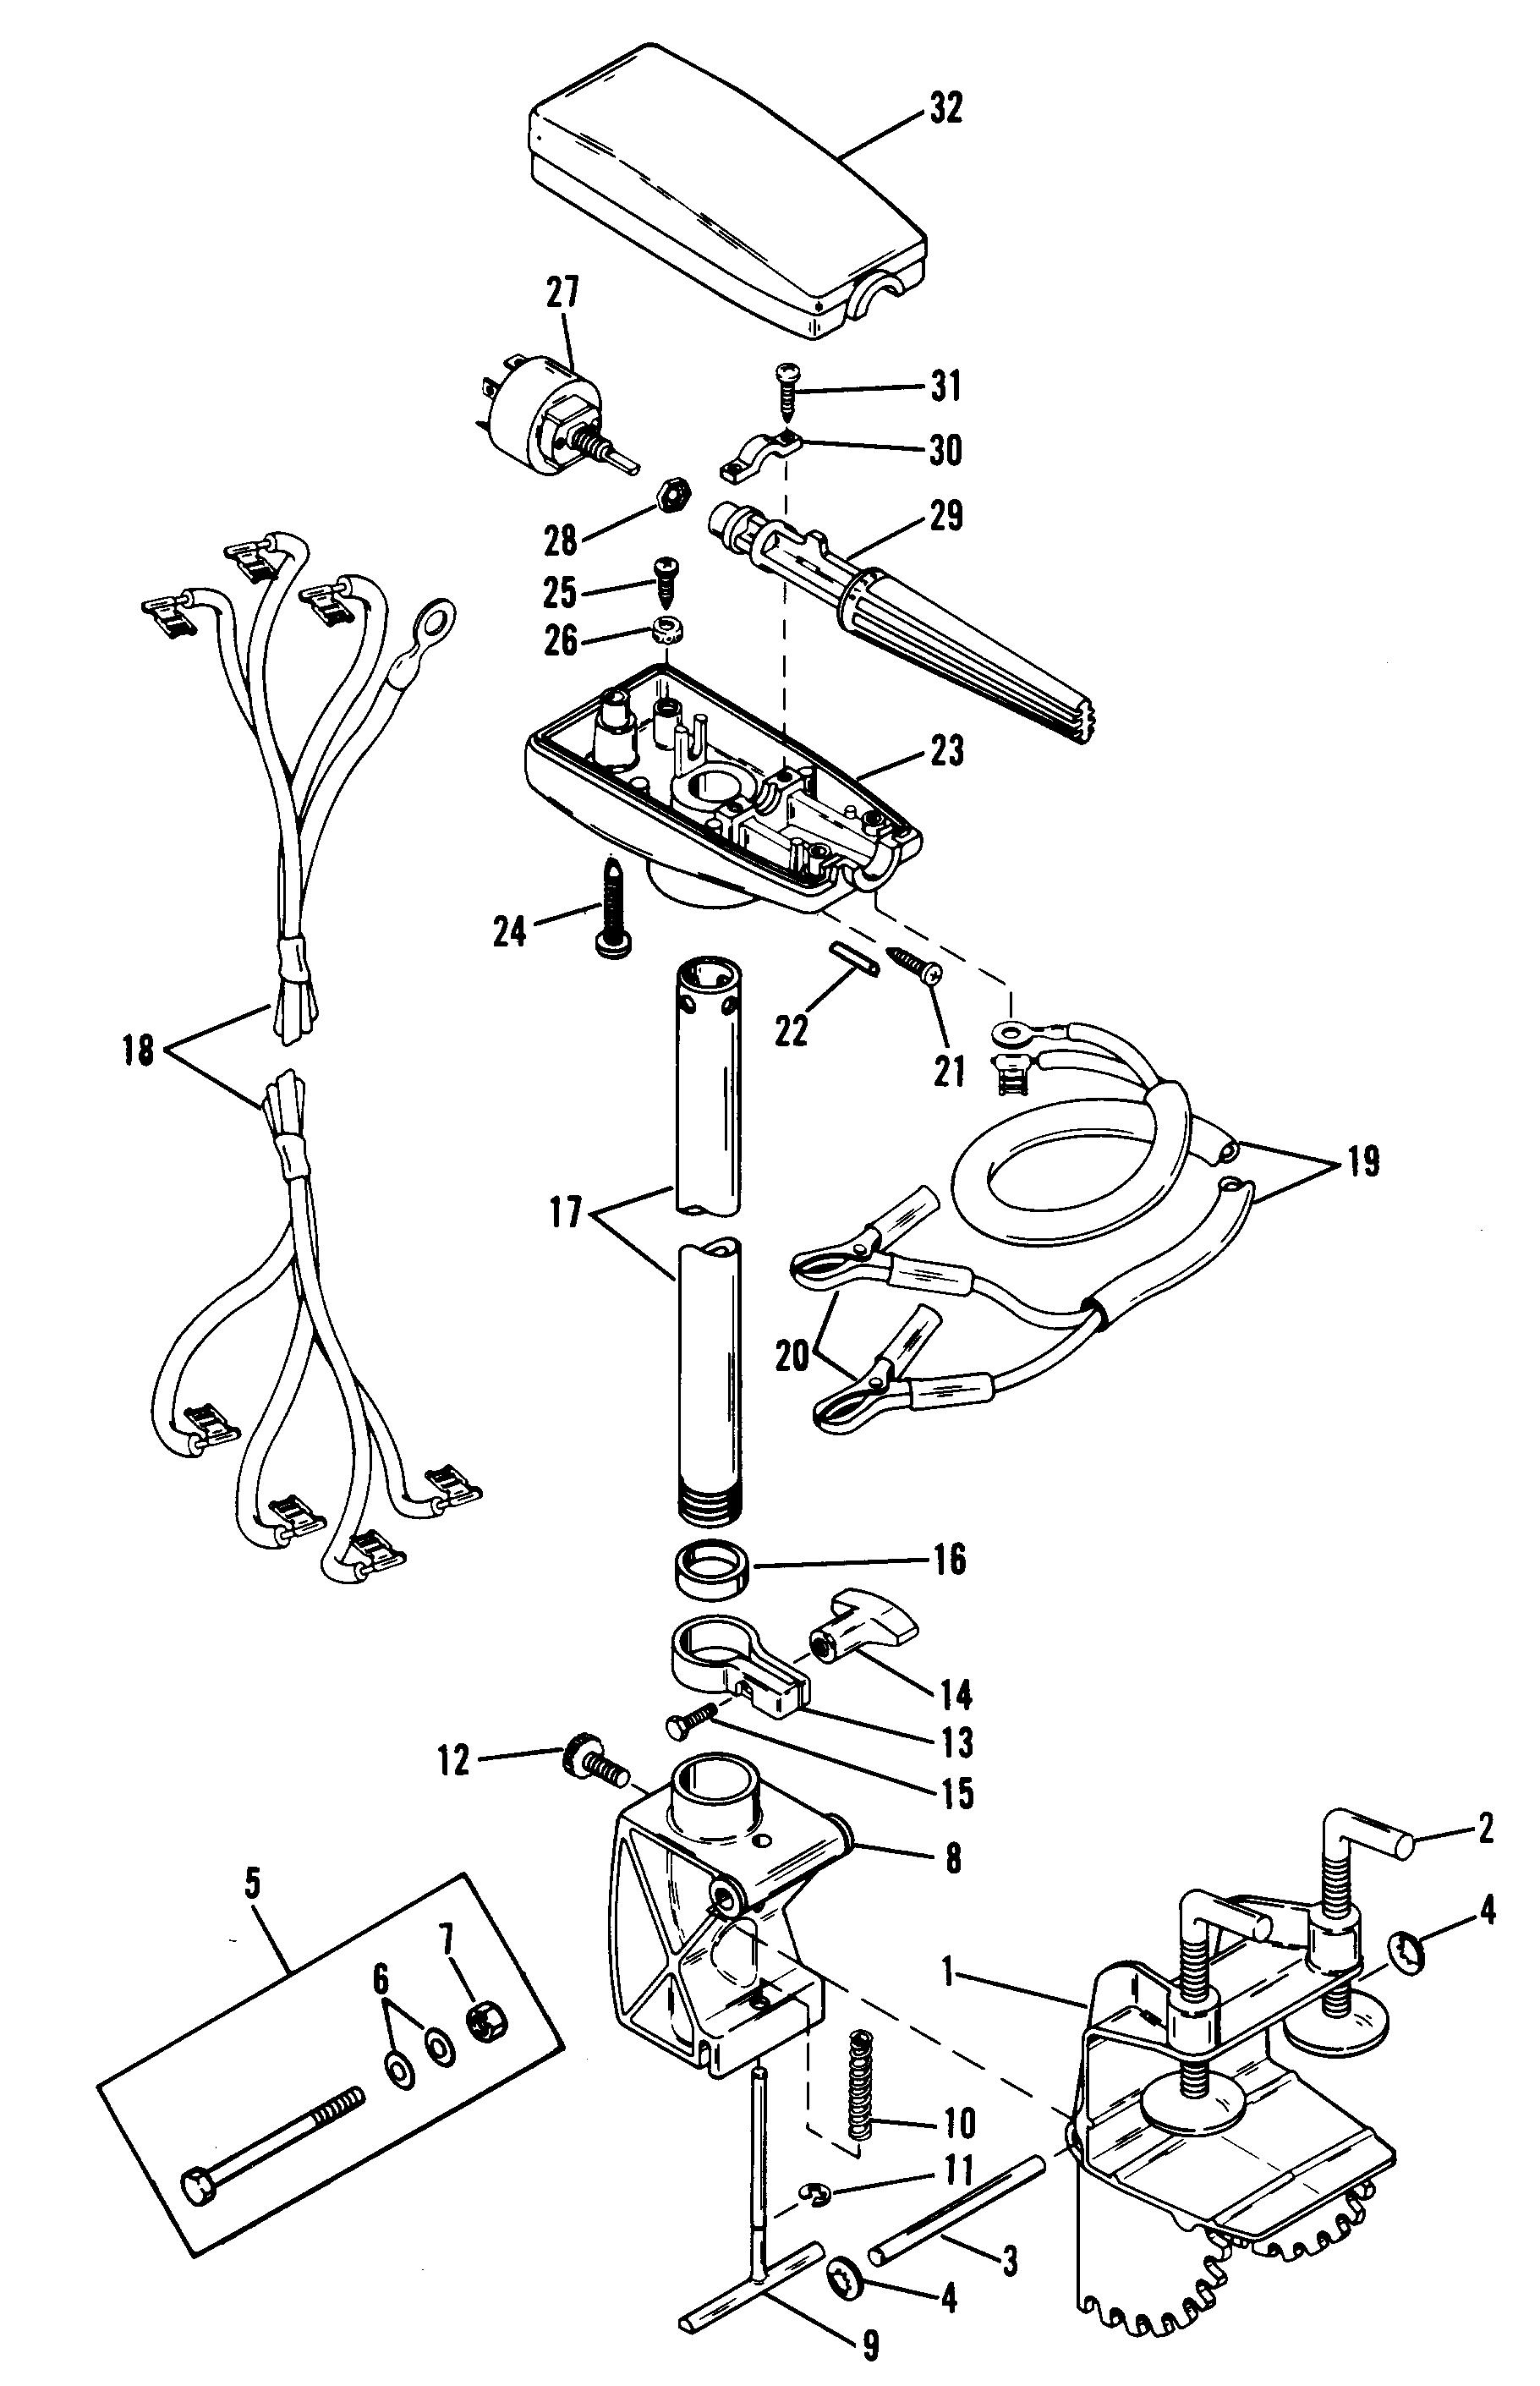 Mercury trolling motor thruster ii 6300953 and up drive mercury outboard lower unit diagram mercury outboard parts diagram pressor